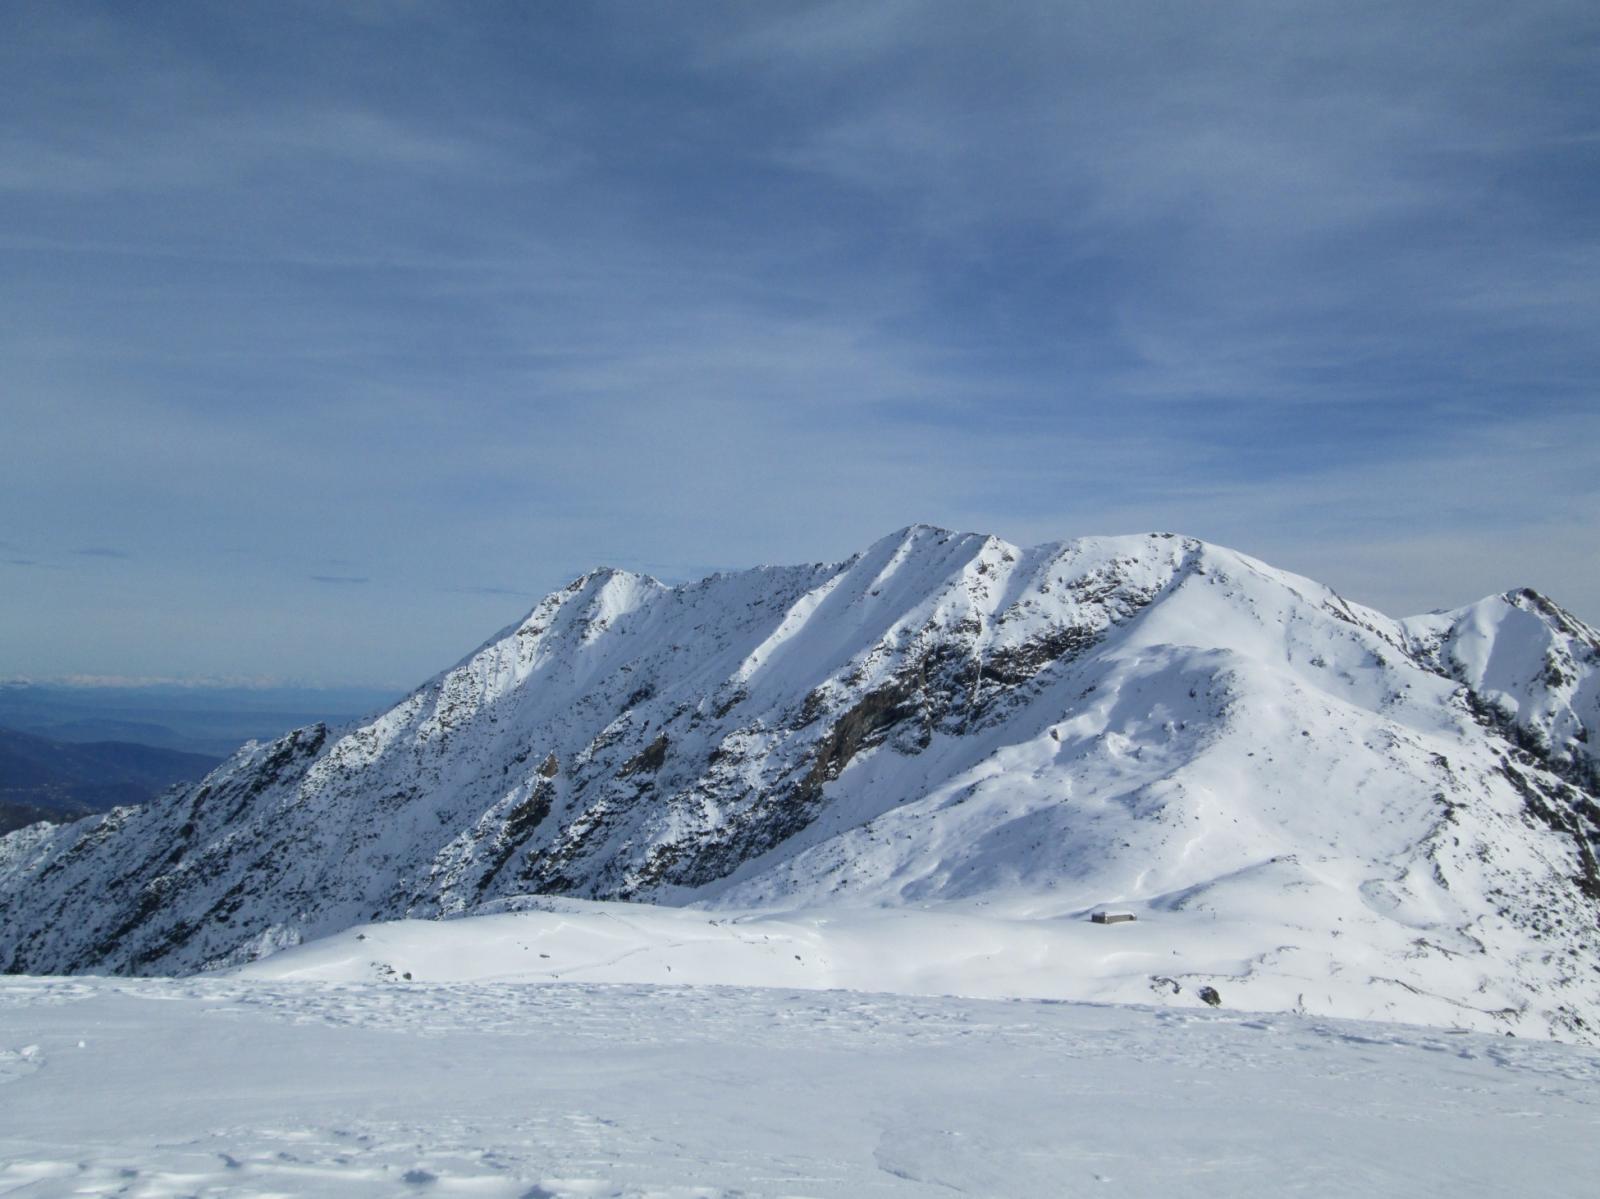 cresta del monte Civrari